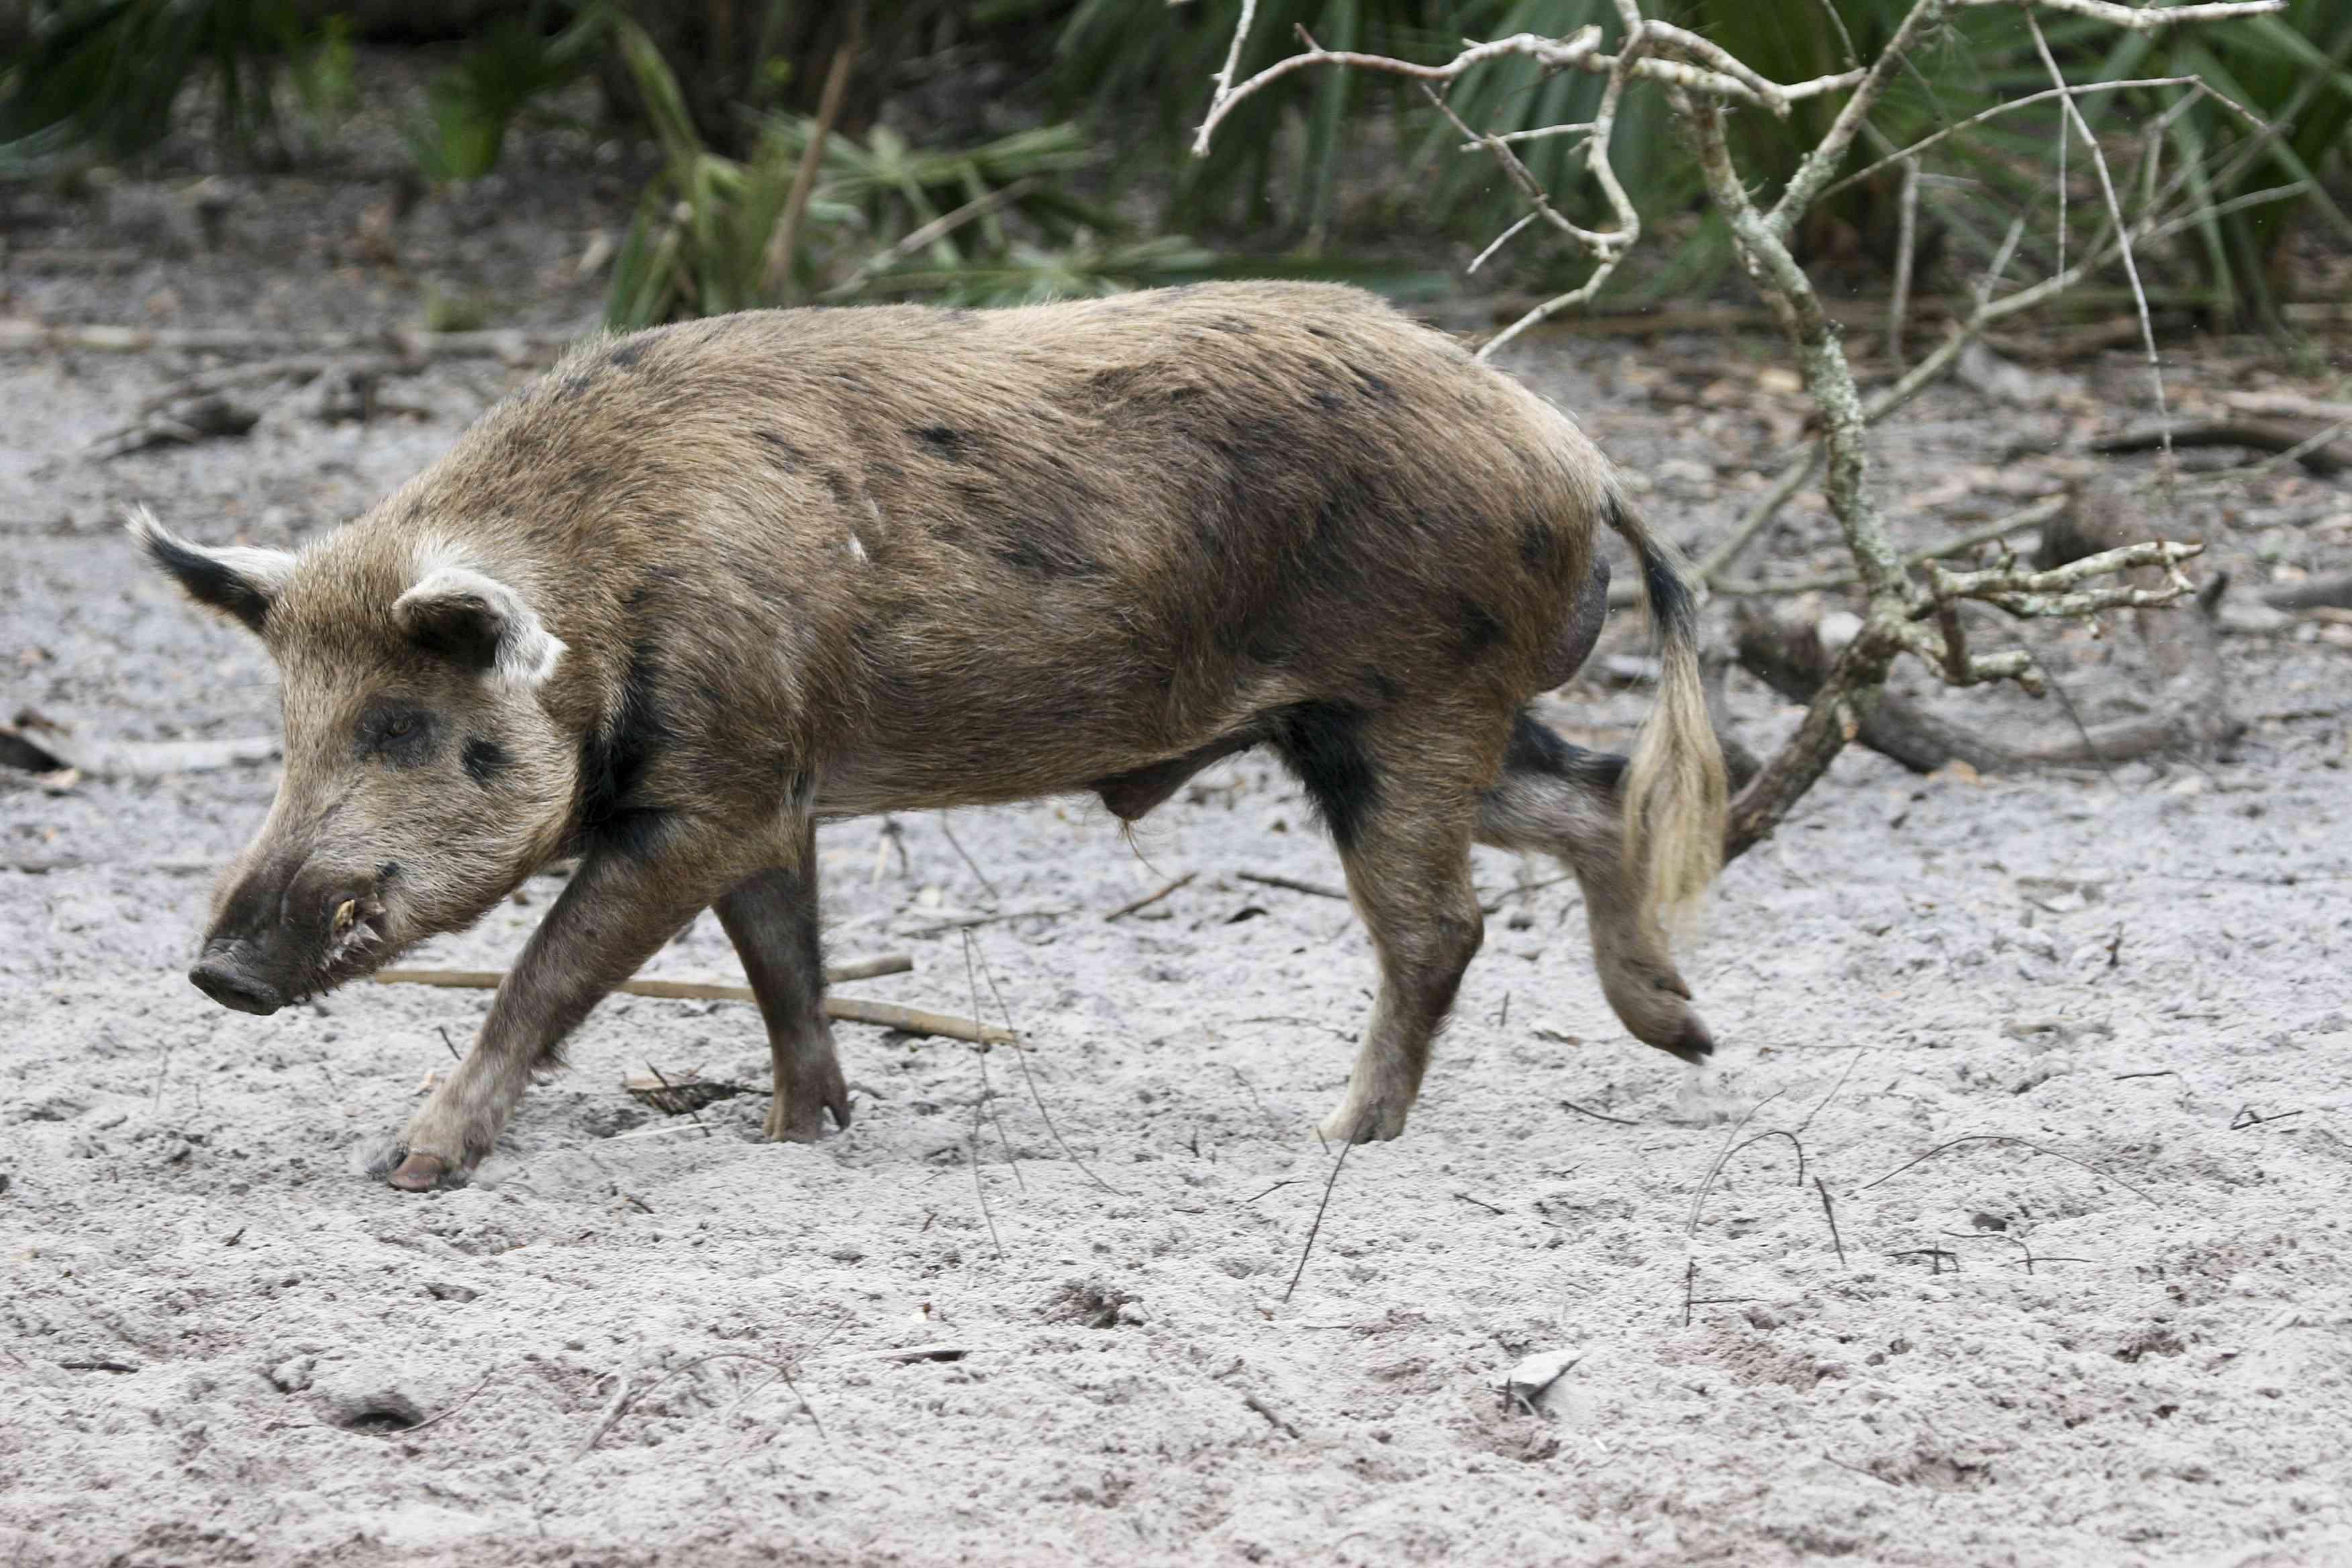 profile of tan and gray hog walking along beach